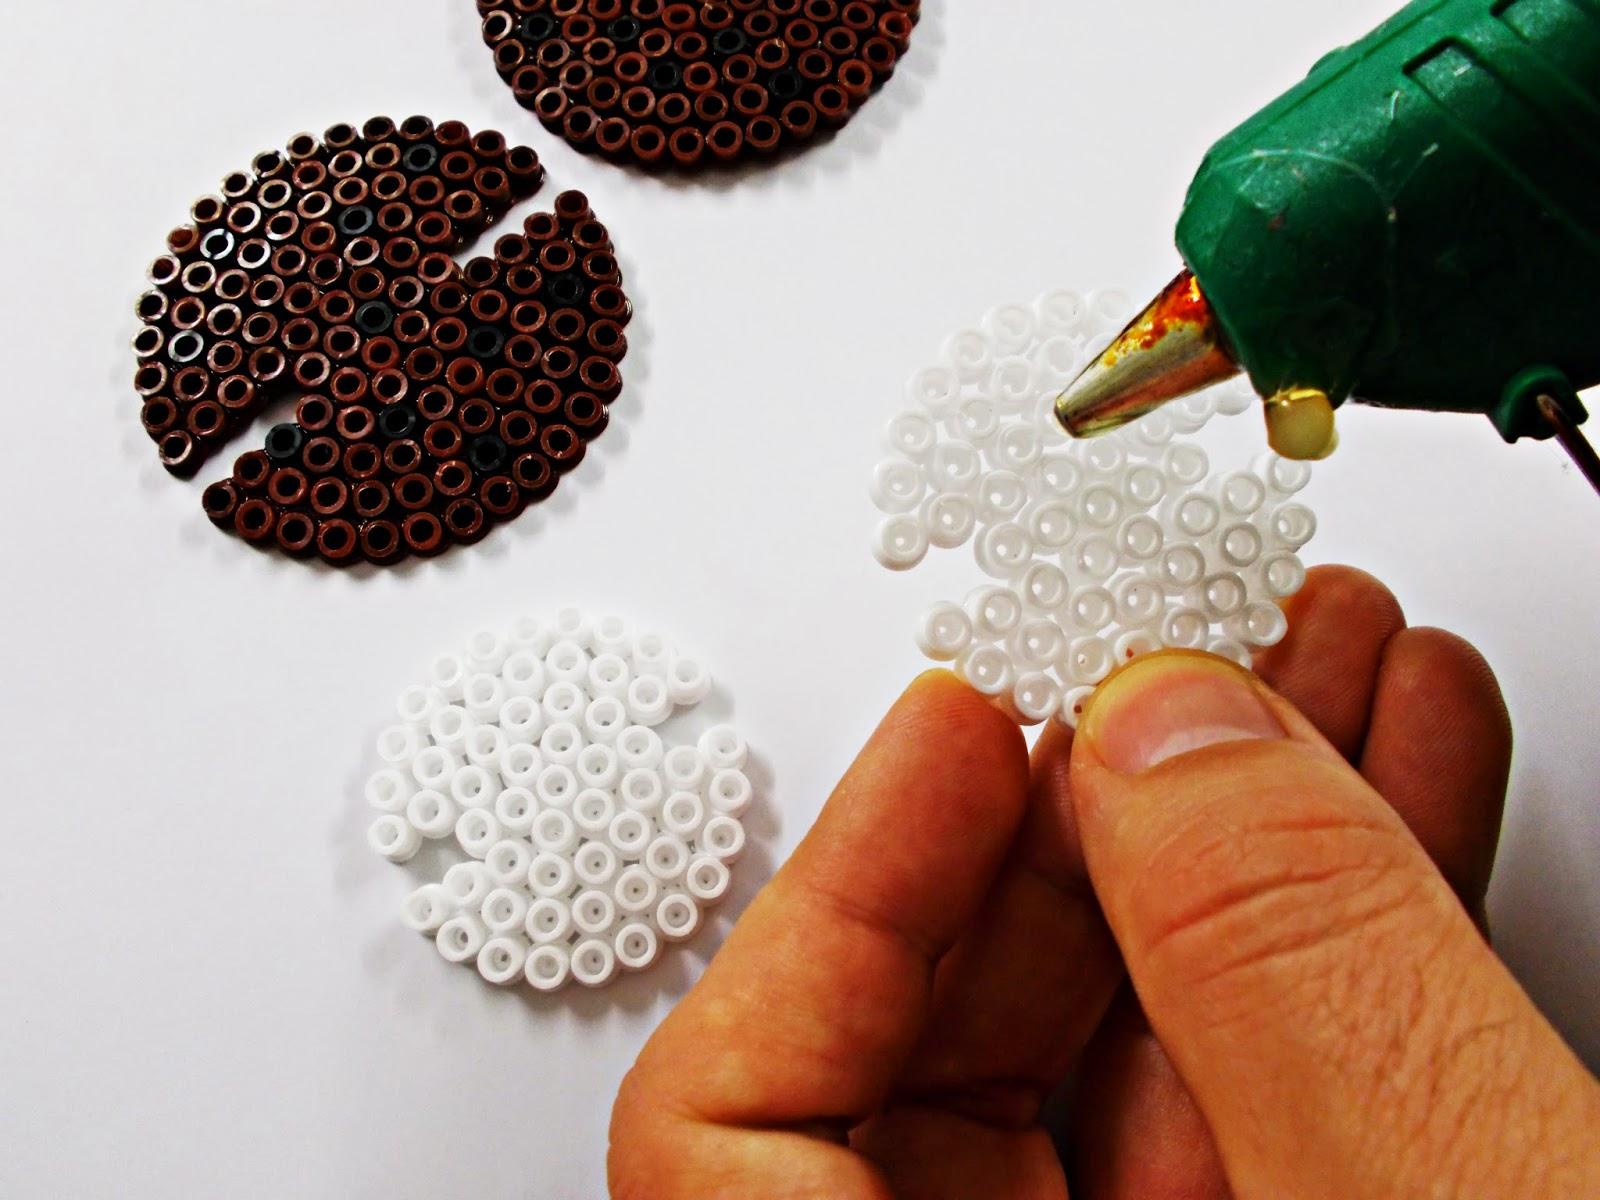 DIY-Hama Beads-ideas-galleta-cookie-guarda auriculares-cables-organizador-7